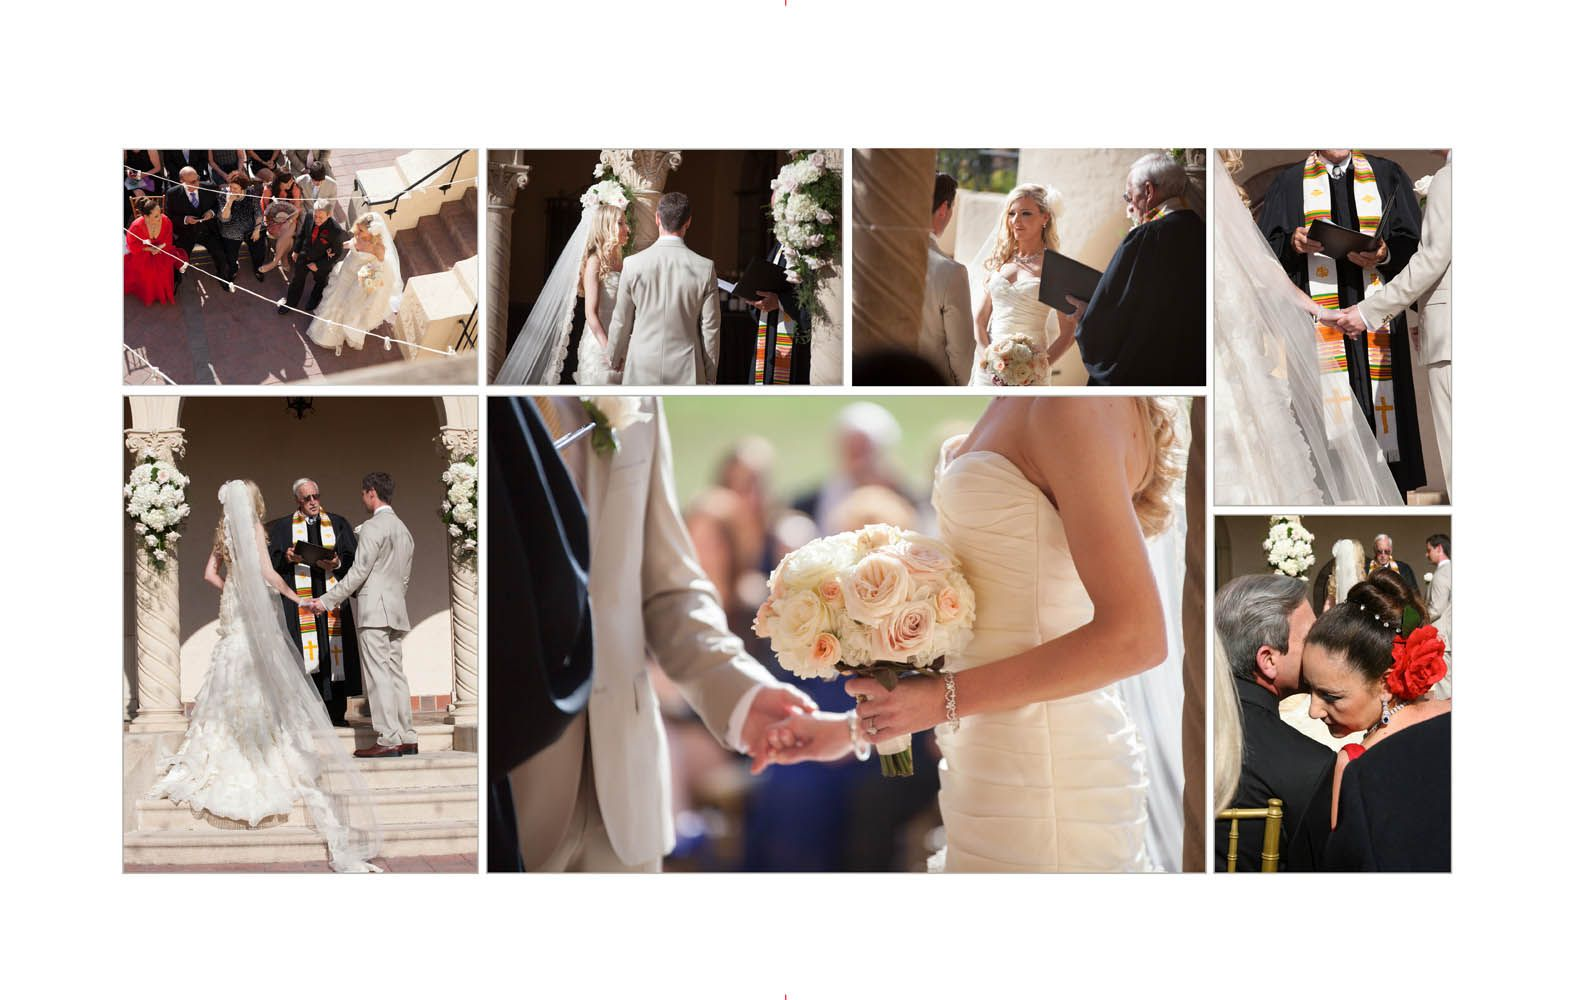 Professional Wedding Photo Albums Online Wedding Photo Books Albums Remembered Wedding Photo Books Wedding Album Layout Wedding Album Design